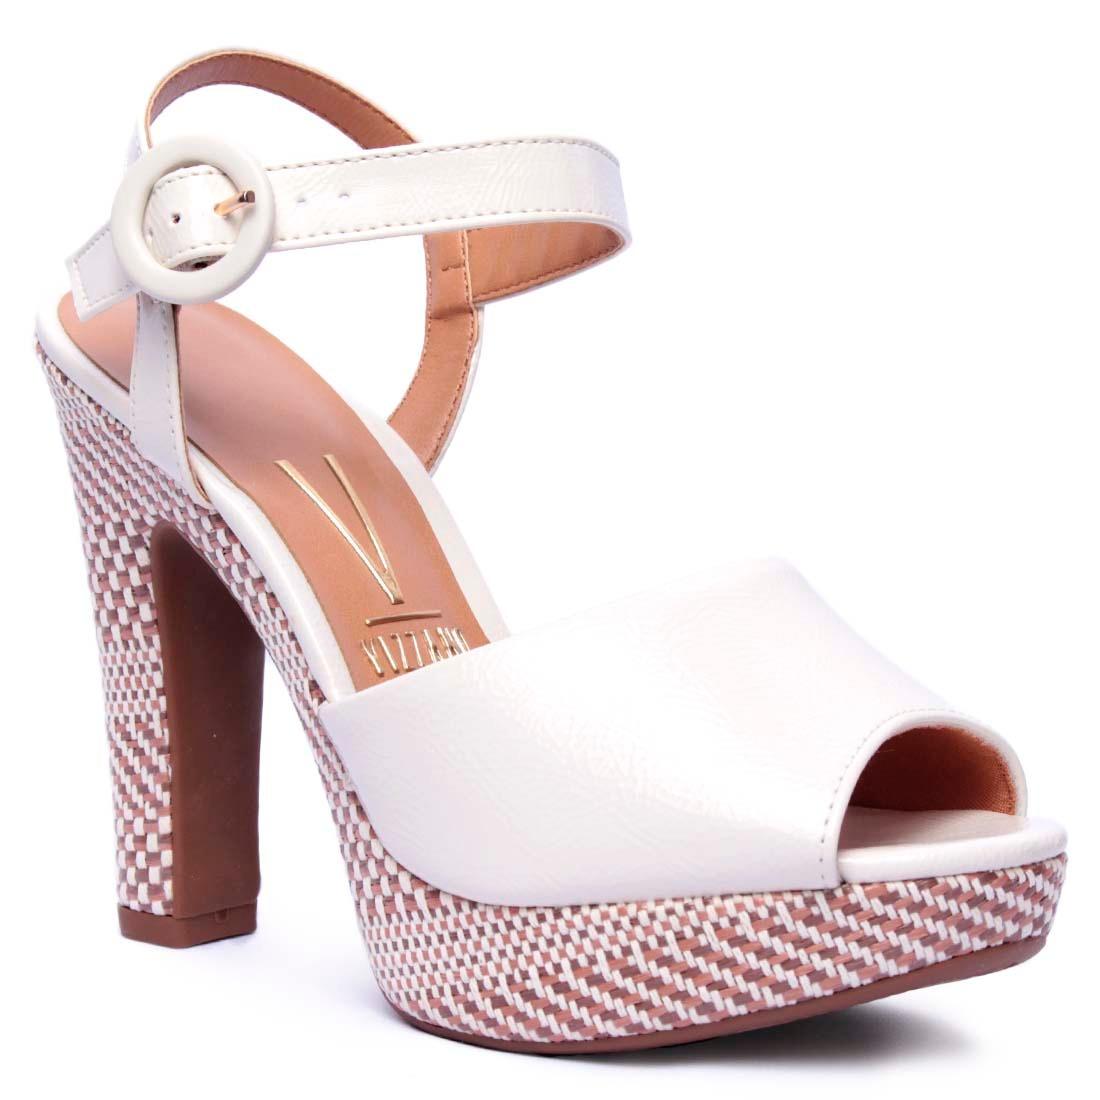 3abbba9671 sandália feminina vizzano meia pata branco off. Carregando zoom.